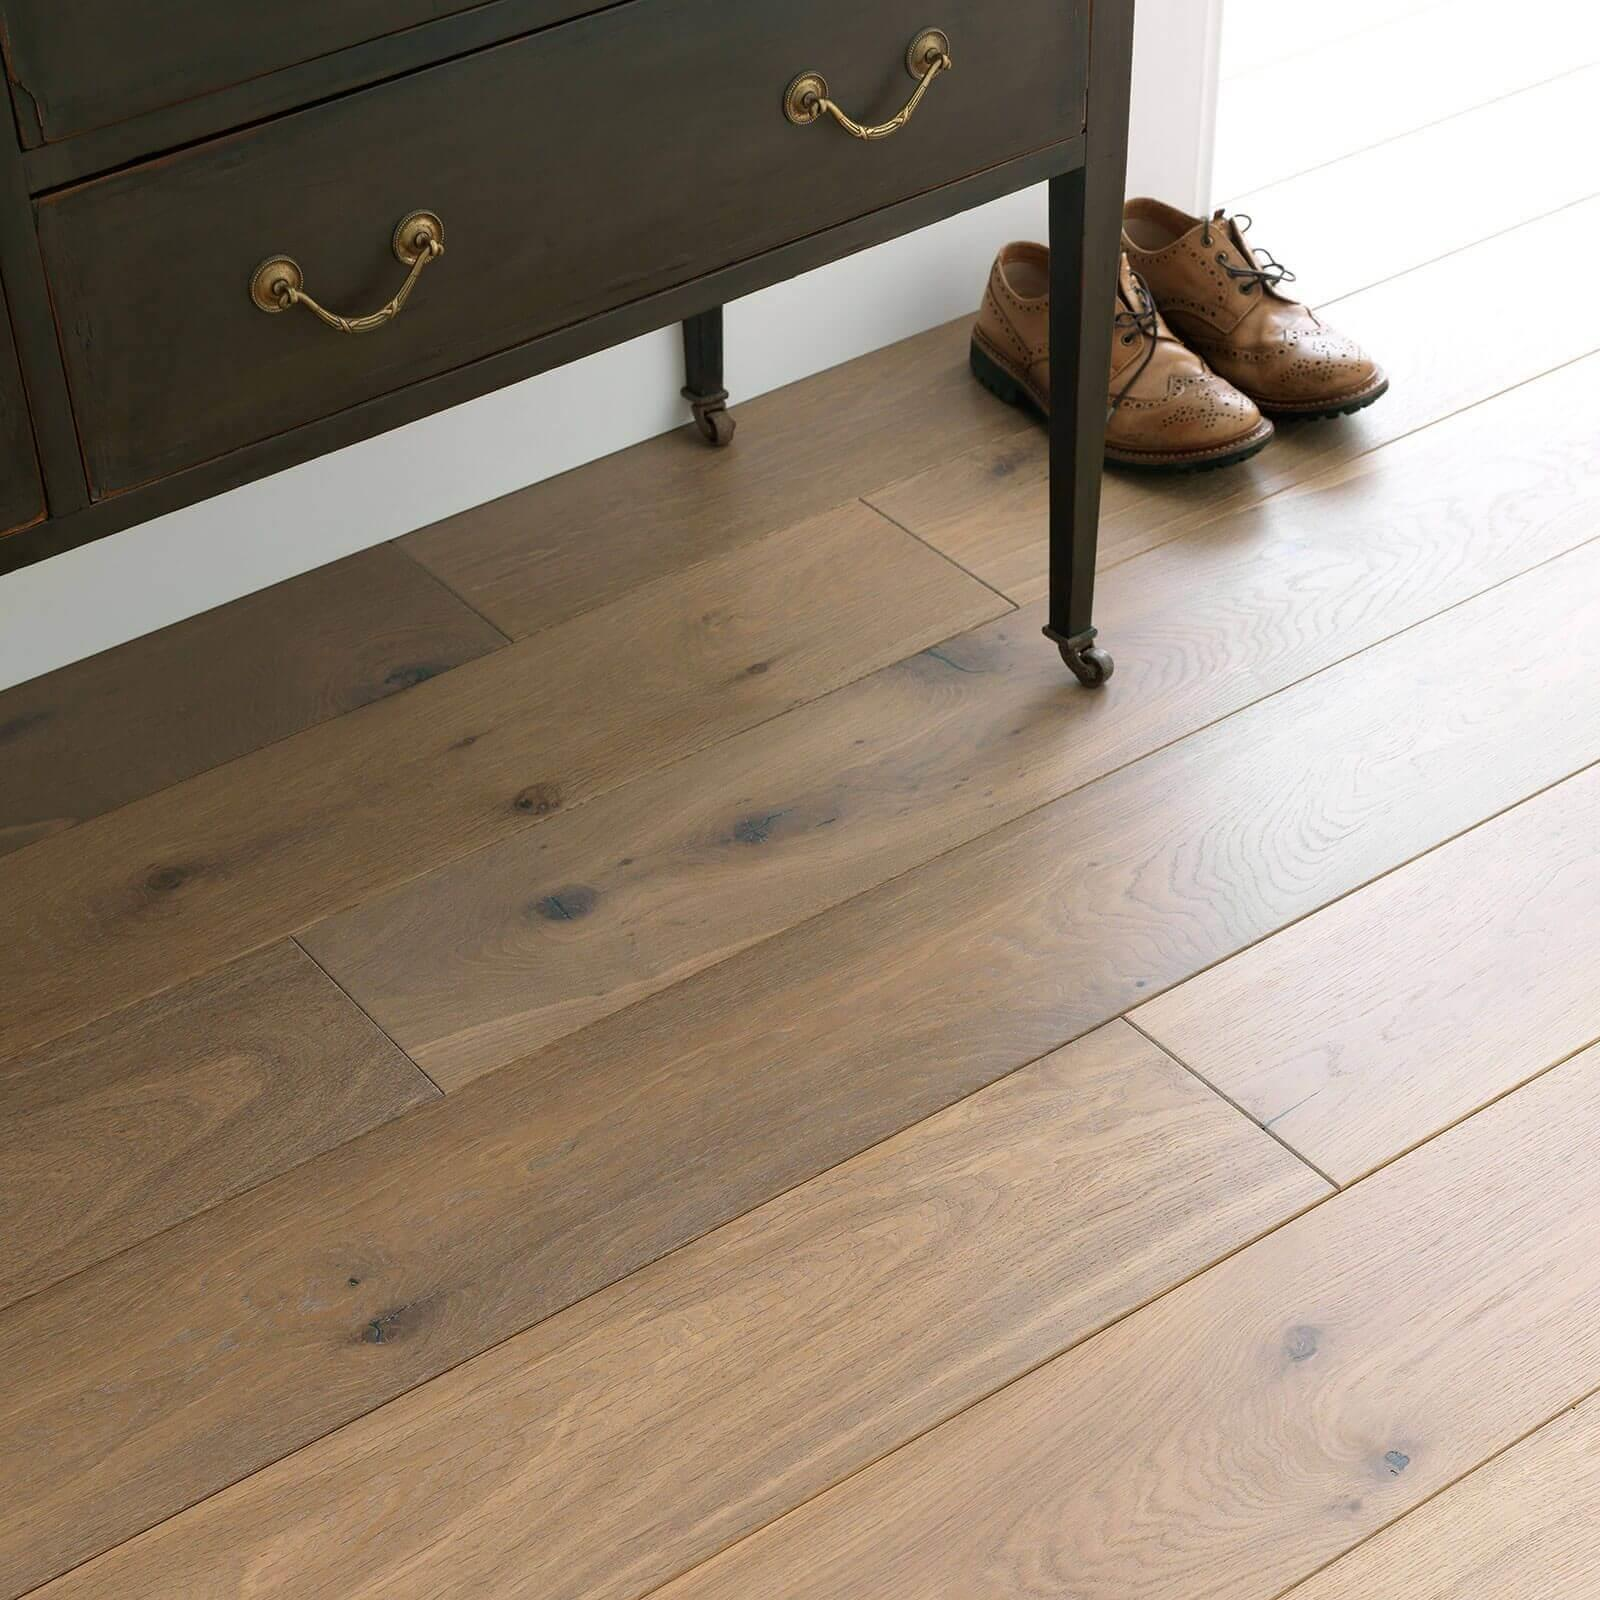 Planed Washed Oak UV Hardwax Oil Chepstow Woodpecker Flooring Lifestyle